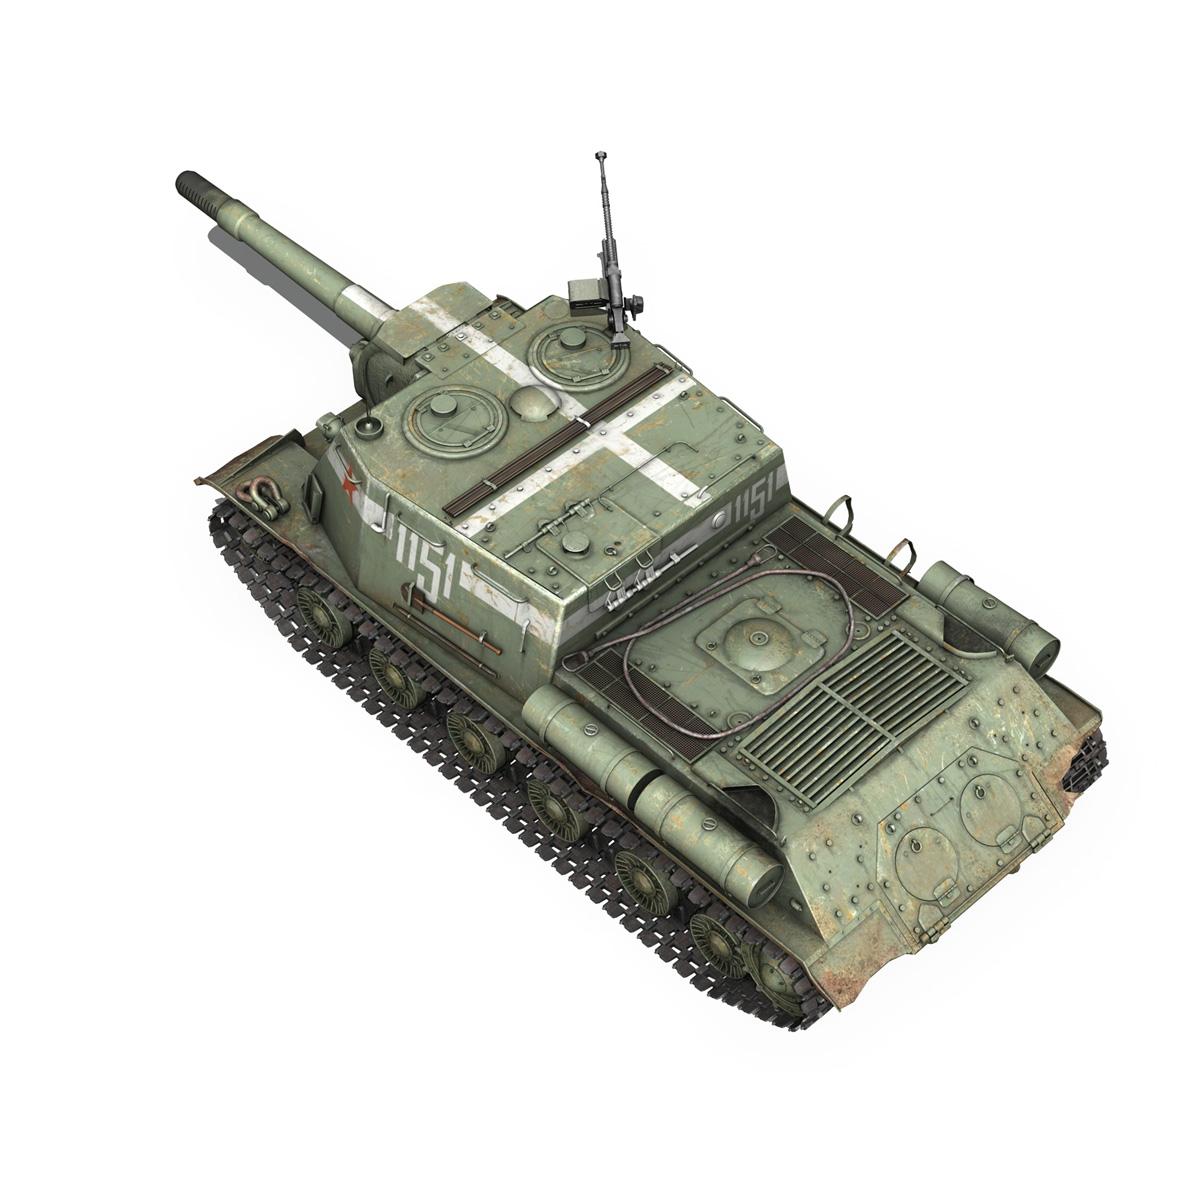 isu 152 soviet heavy self propelled gun 3d model 3ds fbx c4d lwo obj 187529